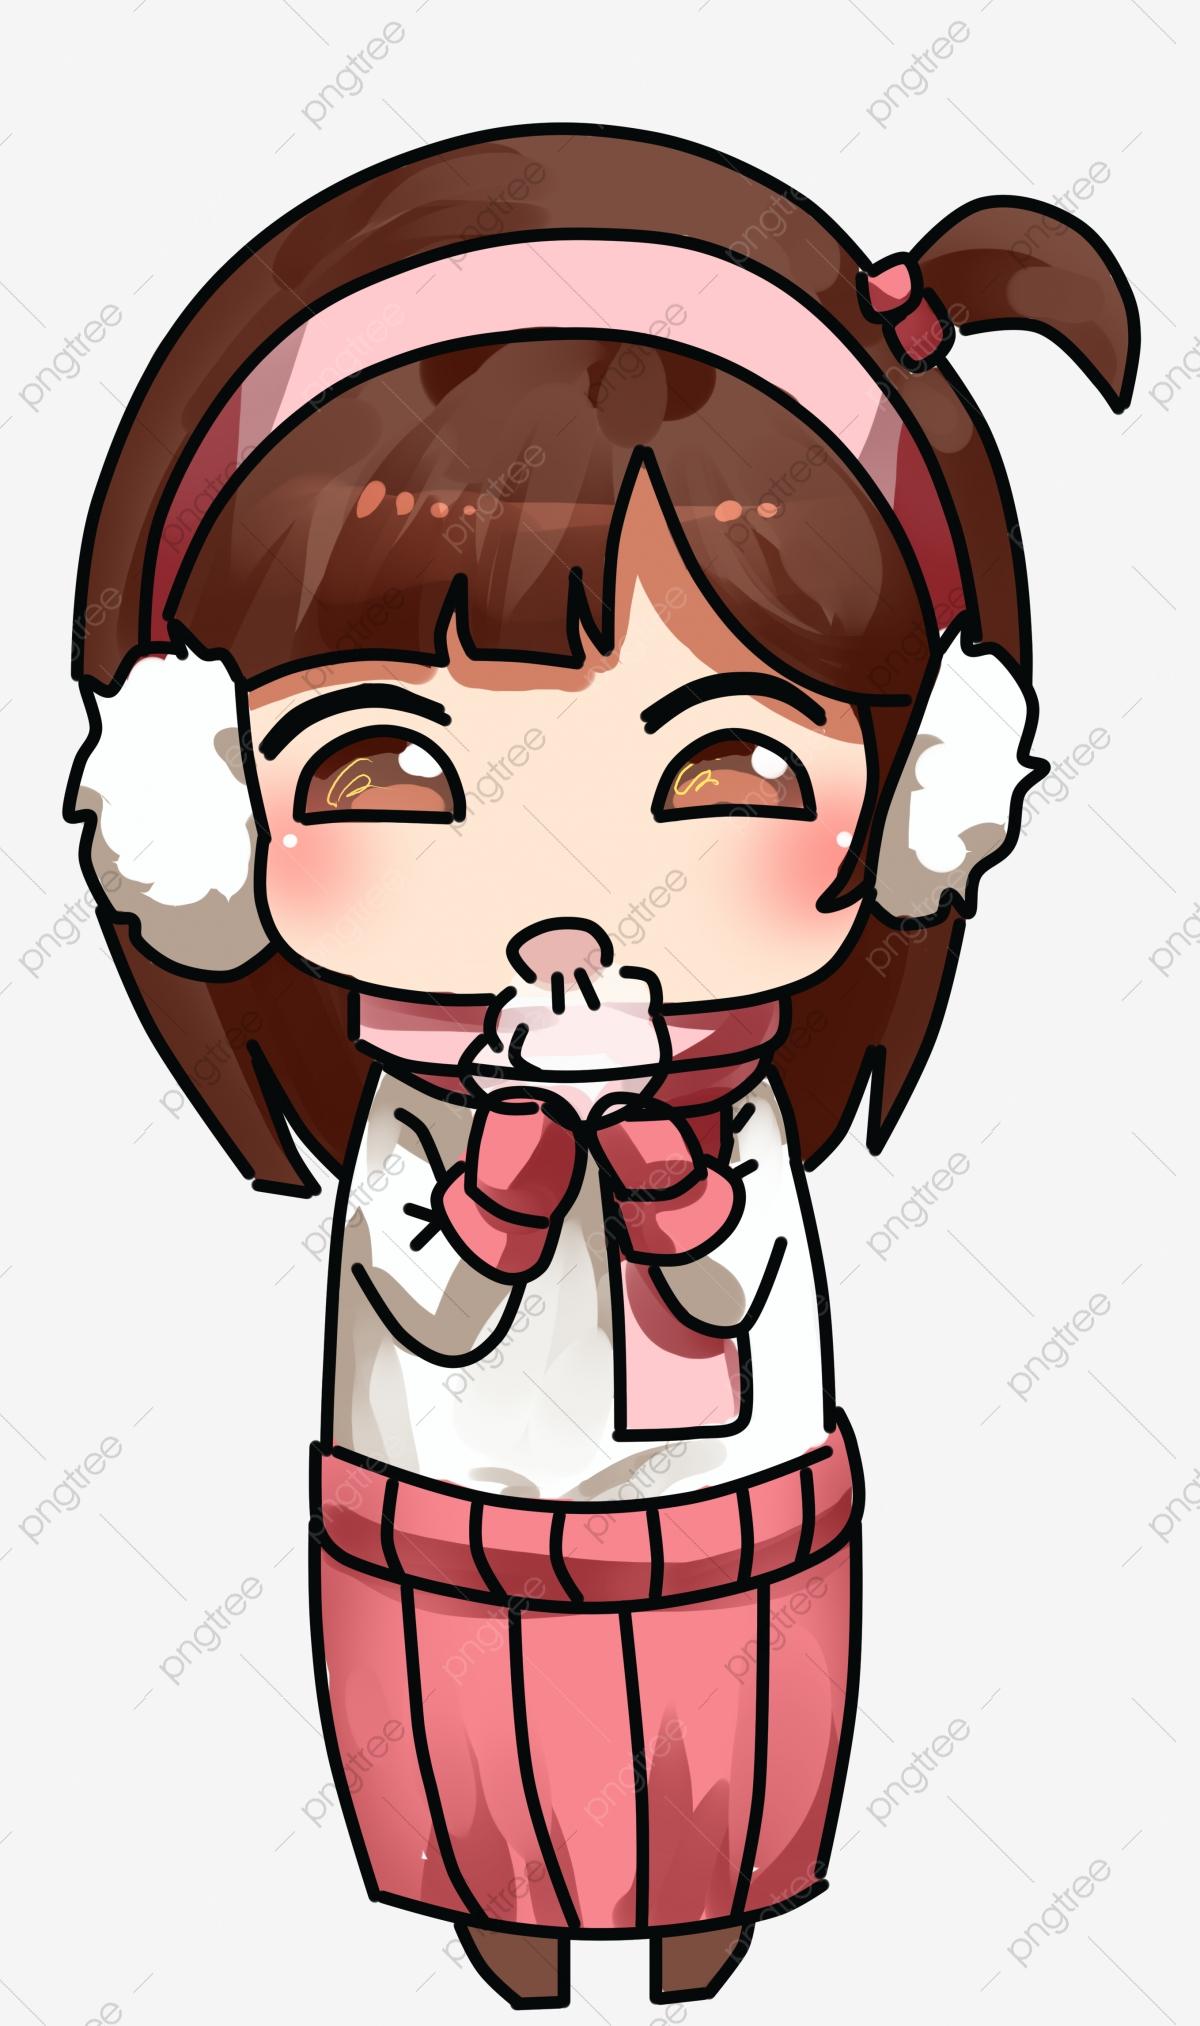 Winter keep warm cotton. Breathe clipart cold breath